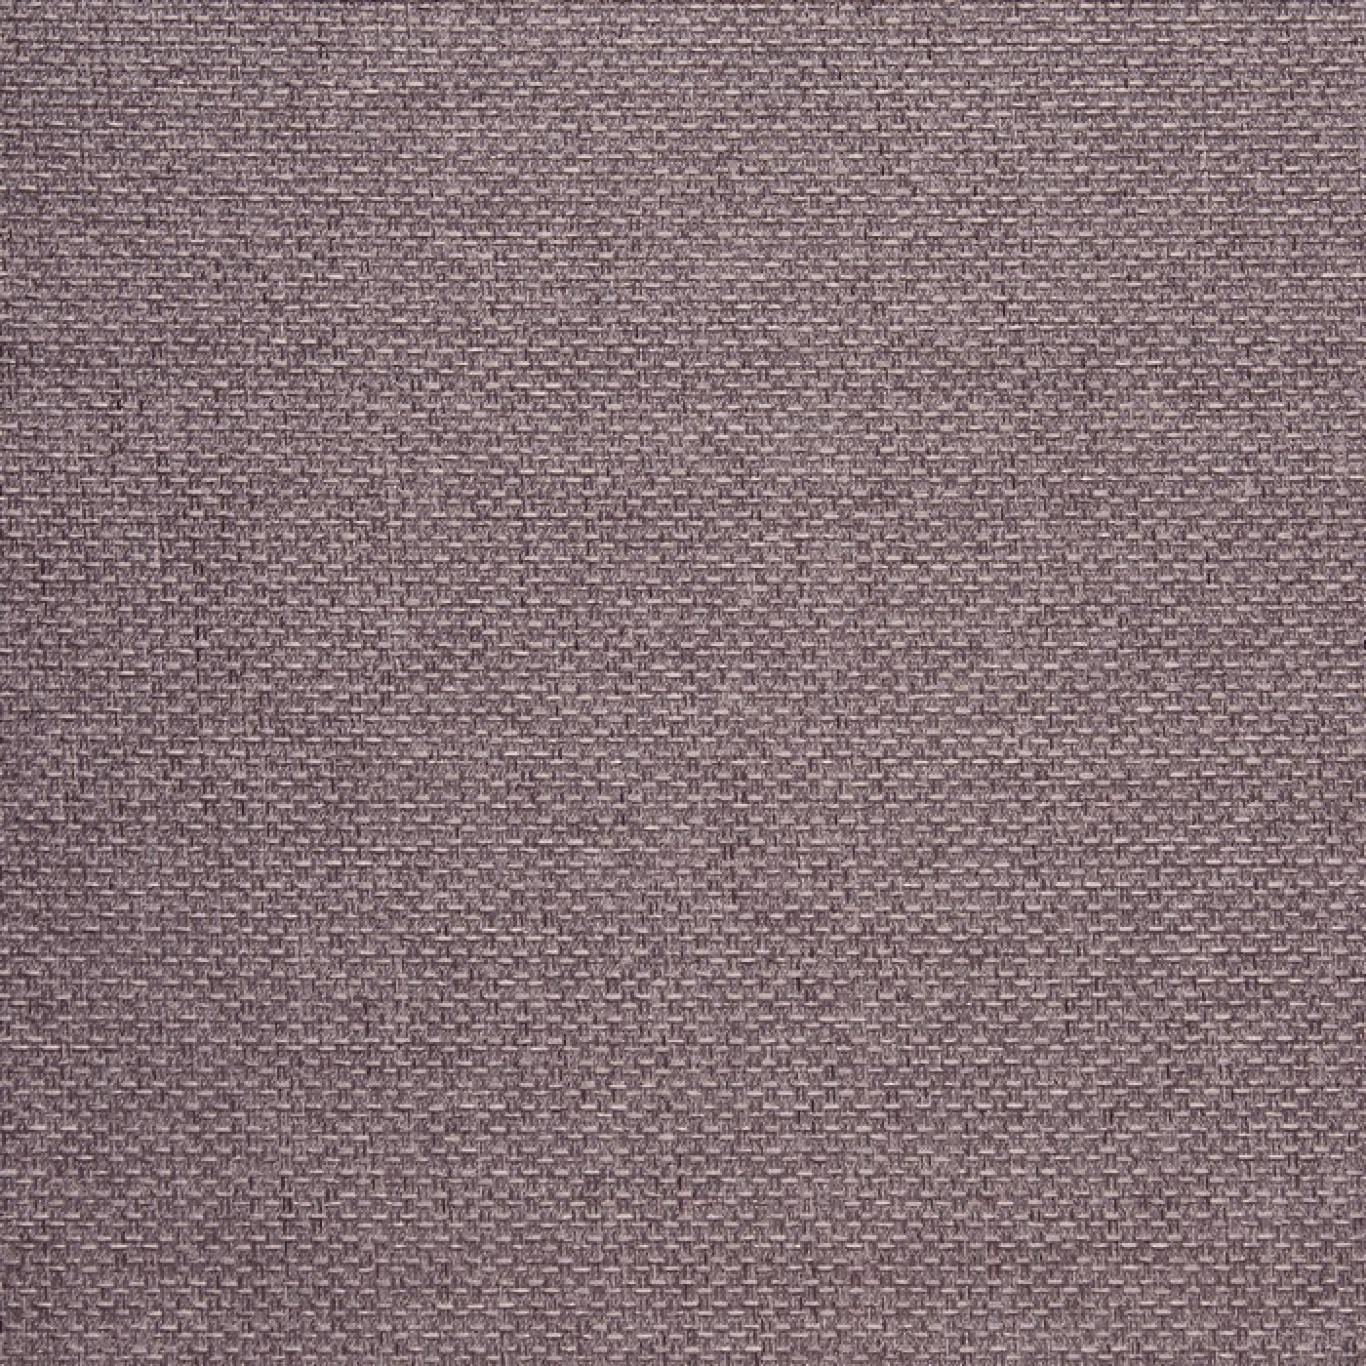 Image of Prestigious Chiltern Thistle FR Fabric 2009/995